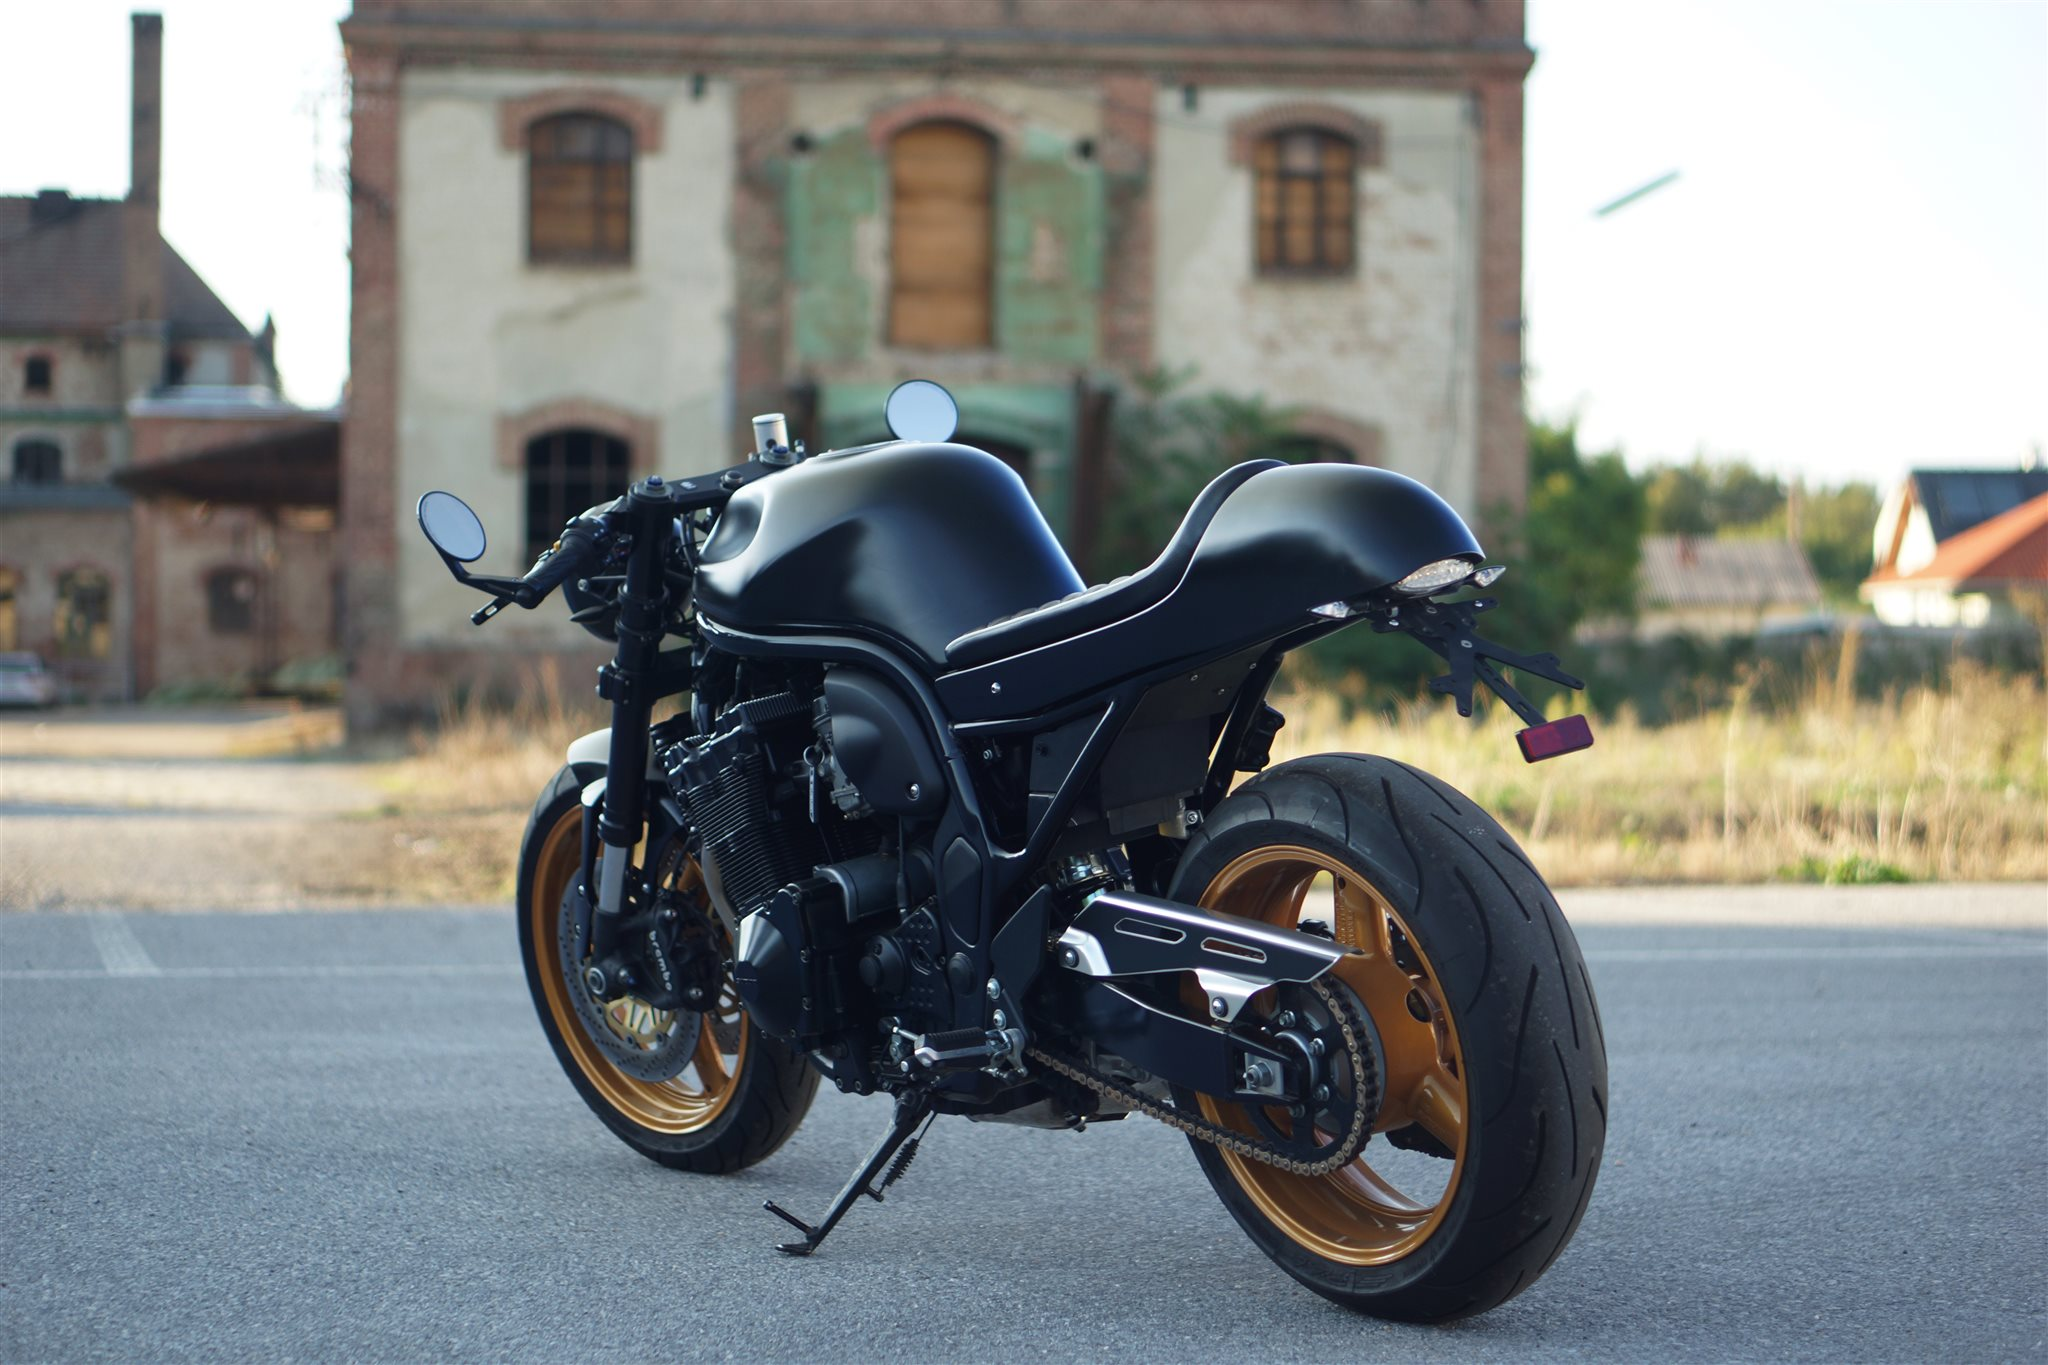 umgebautes motorrad suzuki bandit 1200 von motorrad bogoly. Black Bedroom Furniture Sets. Home Design Ideas